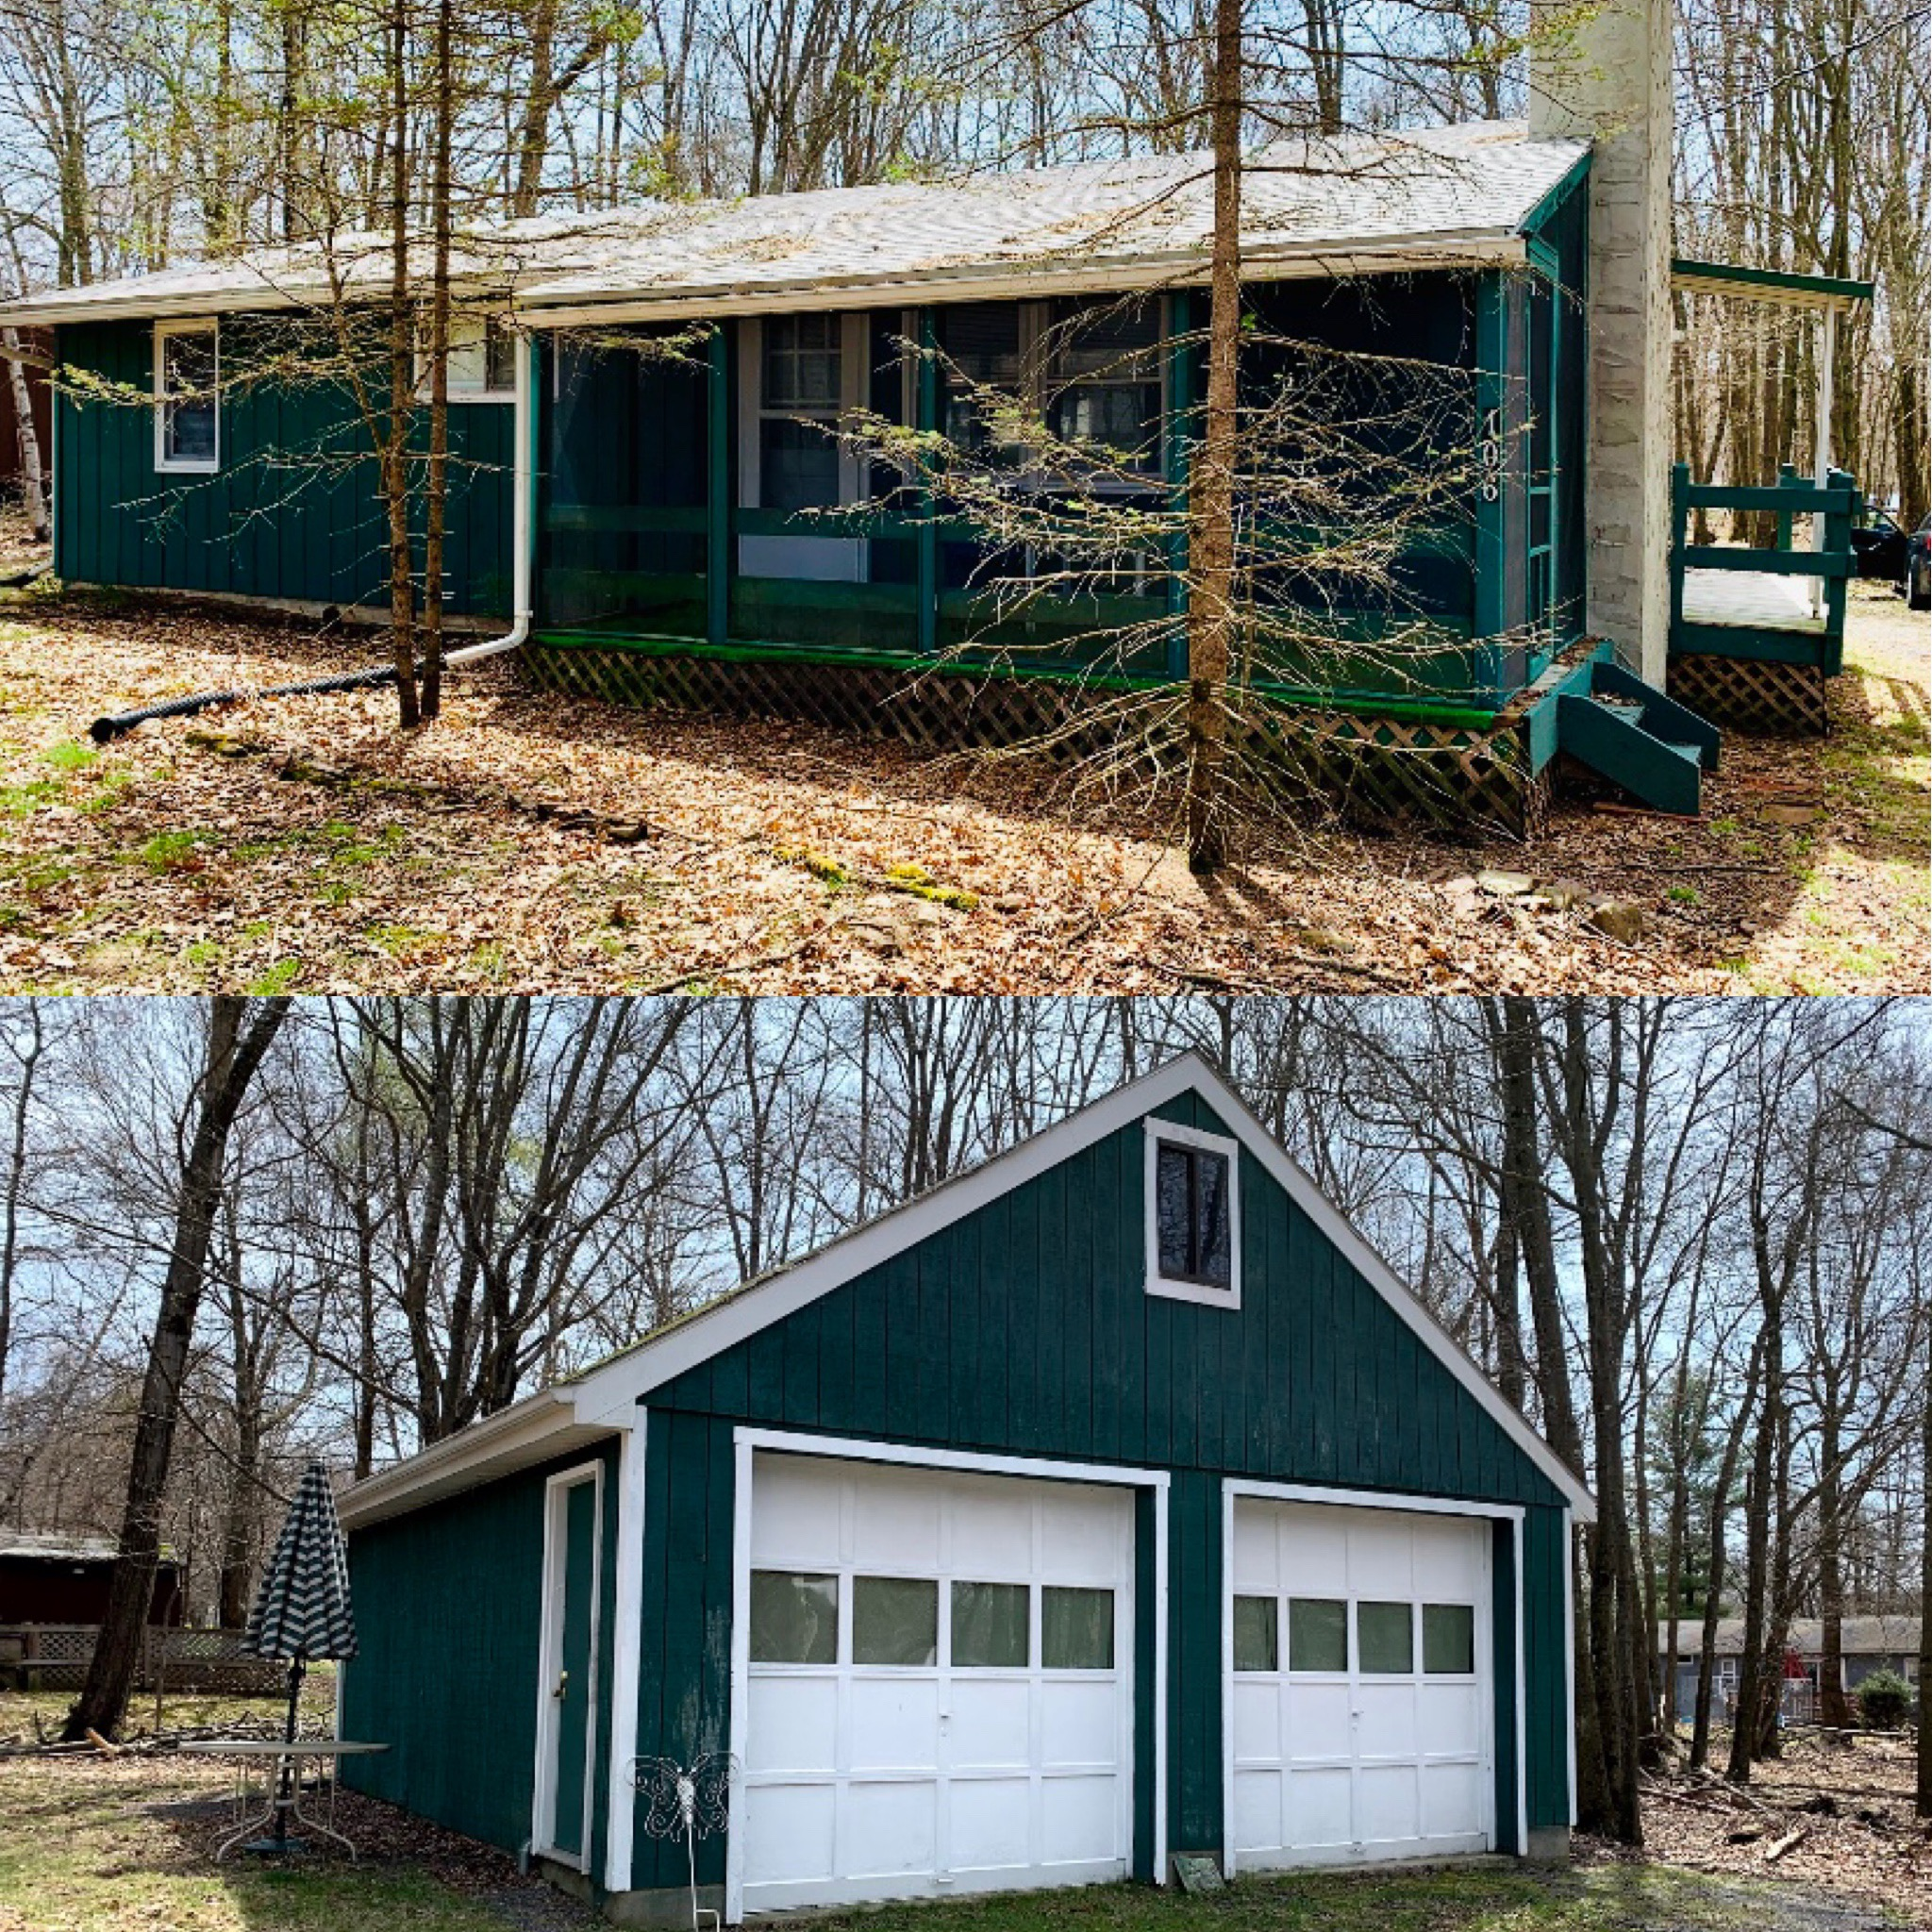 Albrightsville – 3 Bedroom 1 Bath $104,000